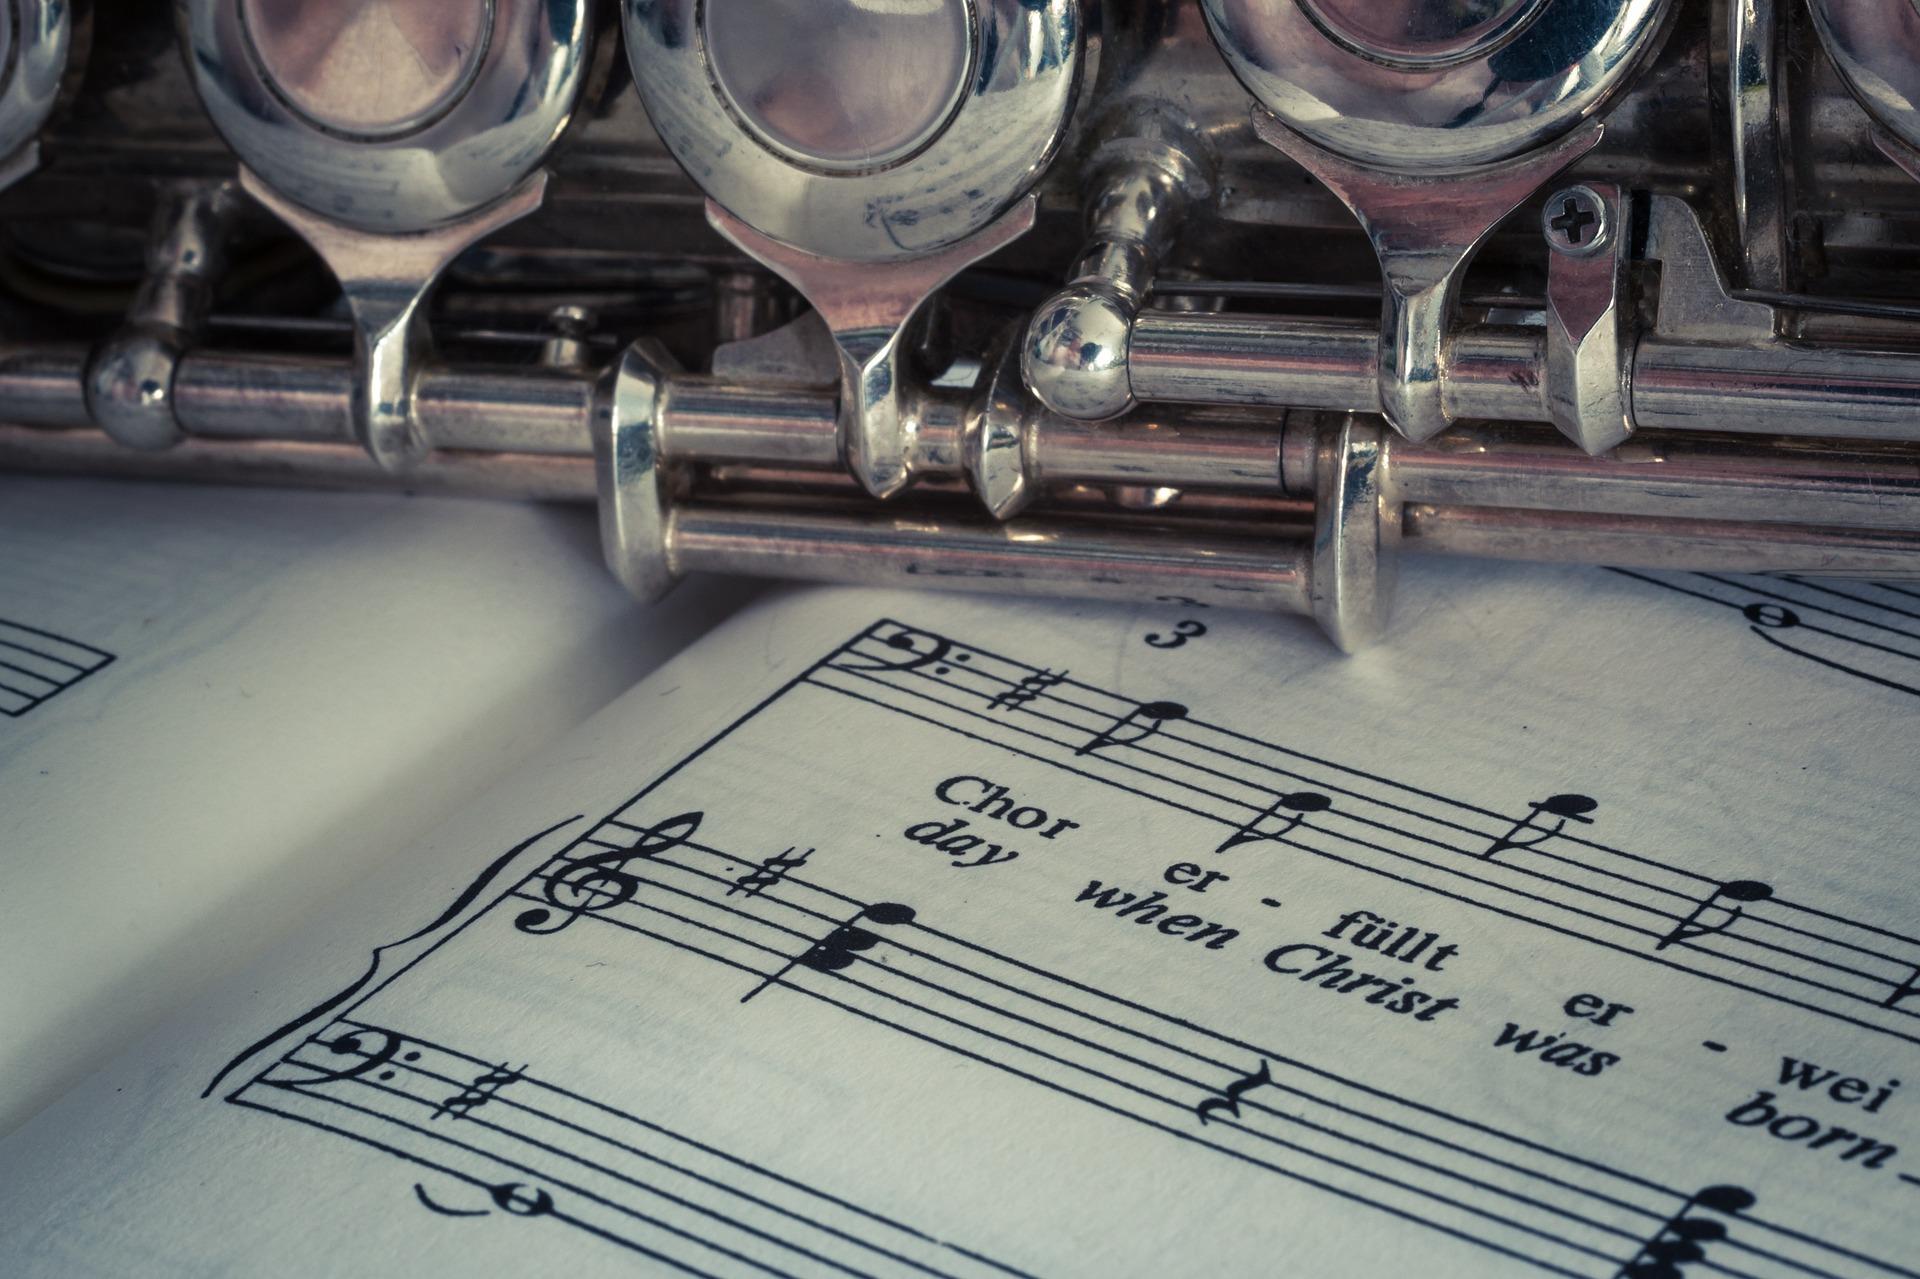 flauta, partitura, instrumento musical, pentagrama, notas musicales, flauta travesera, plateado - Fondos de Pantalla HD - professor-falken.com